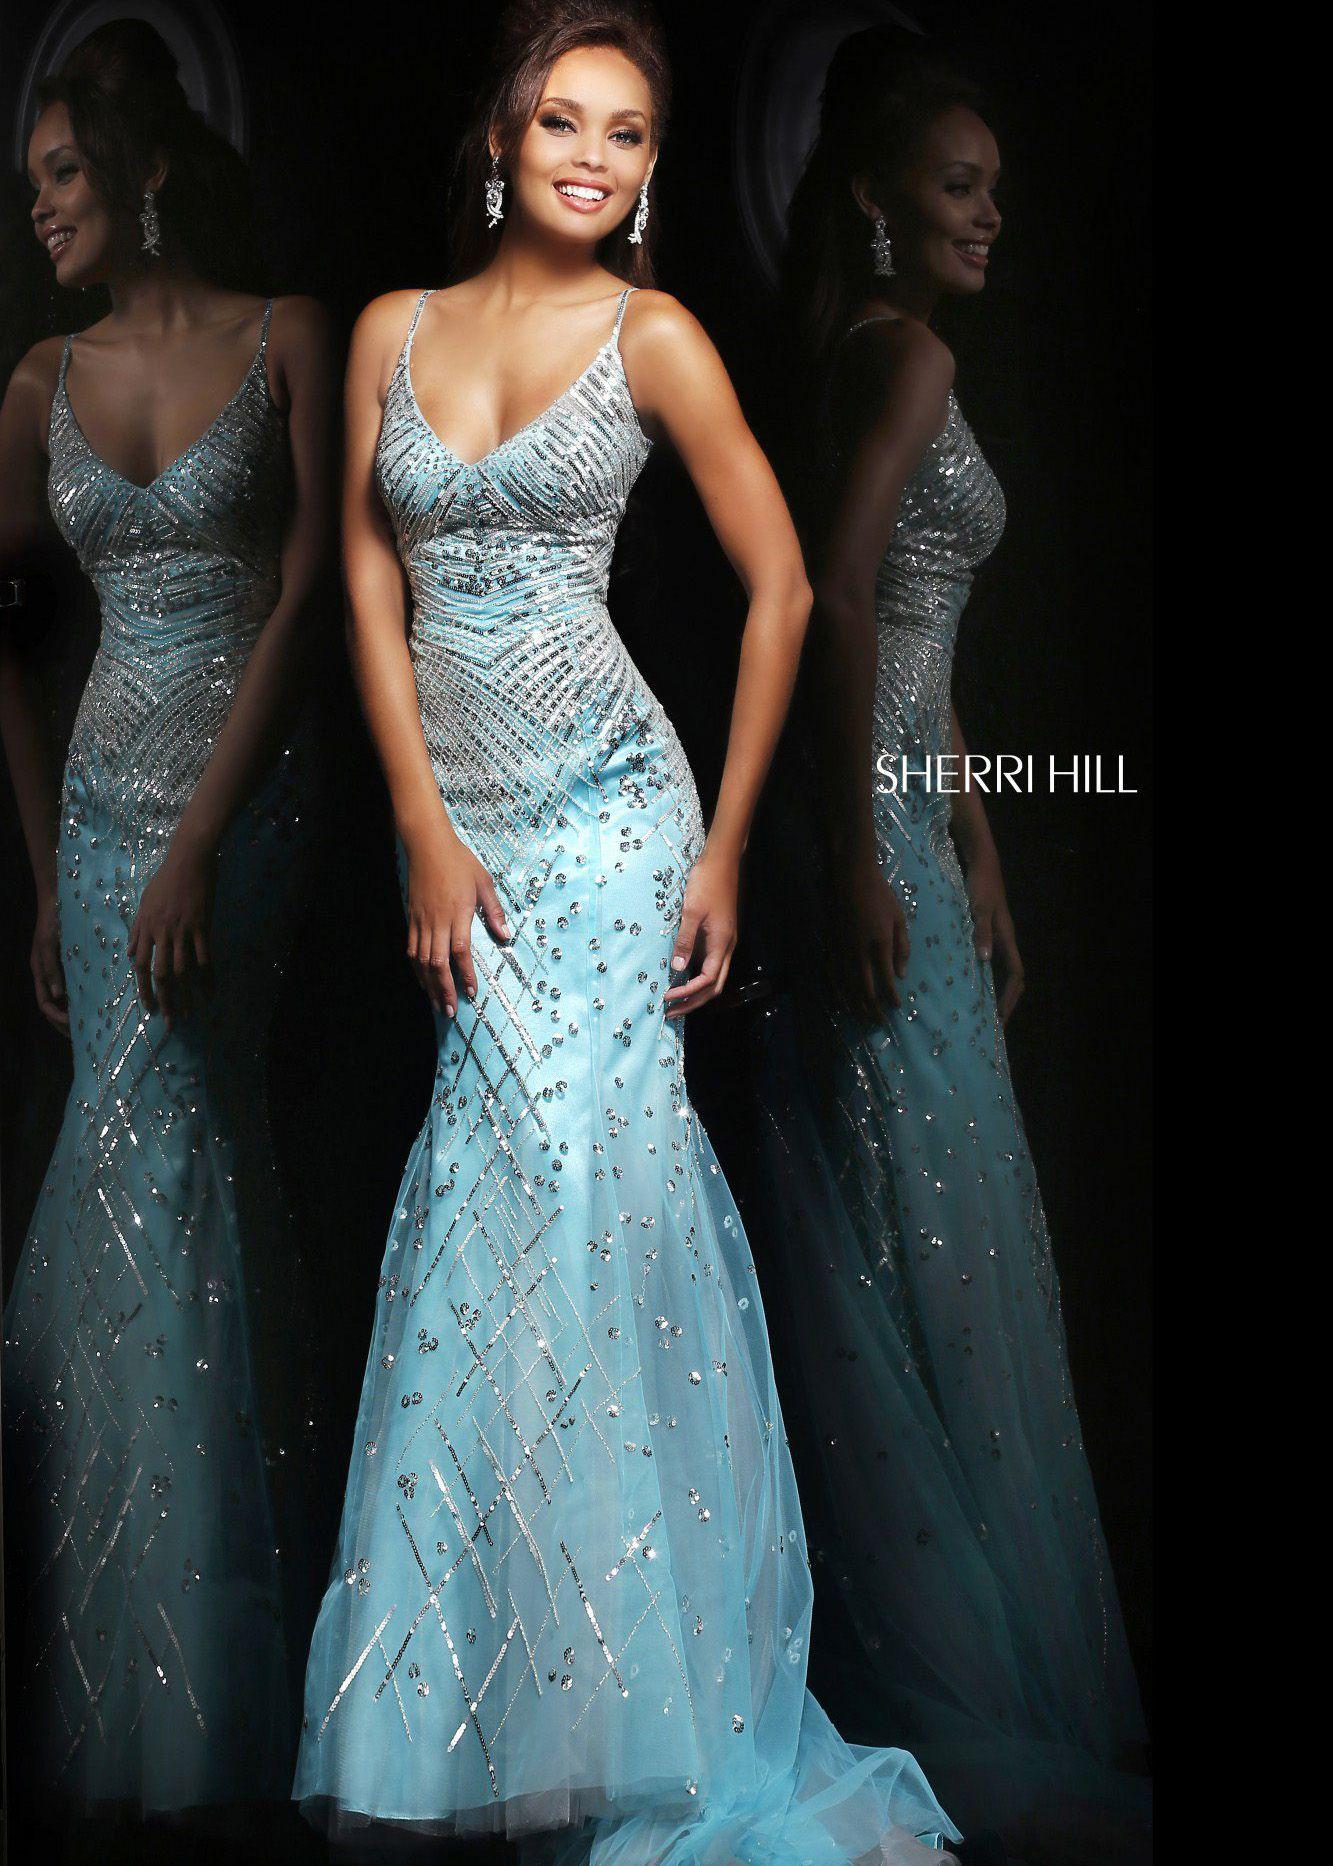 Sherri Hill 21325 - Aqua/Silver Sequin Mermaid Prom Dresses Online ...